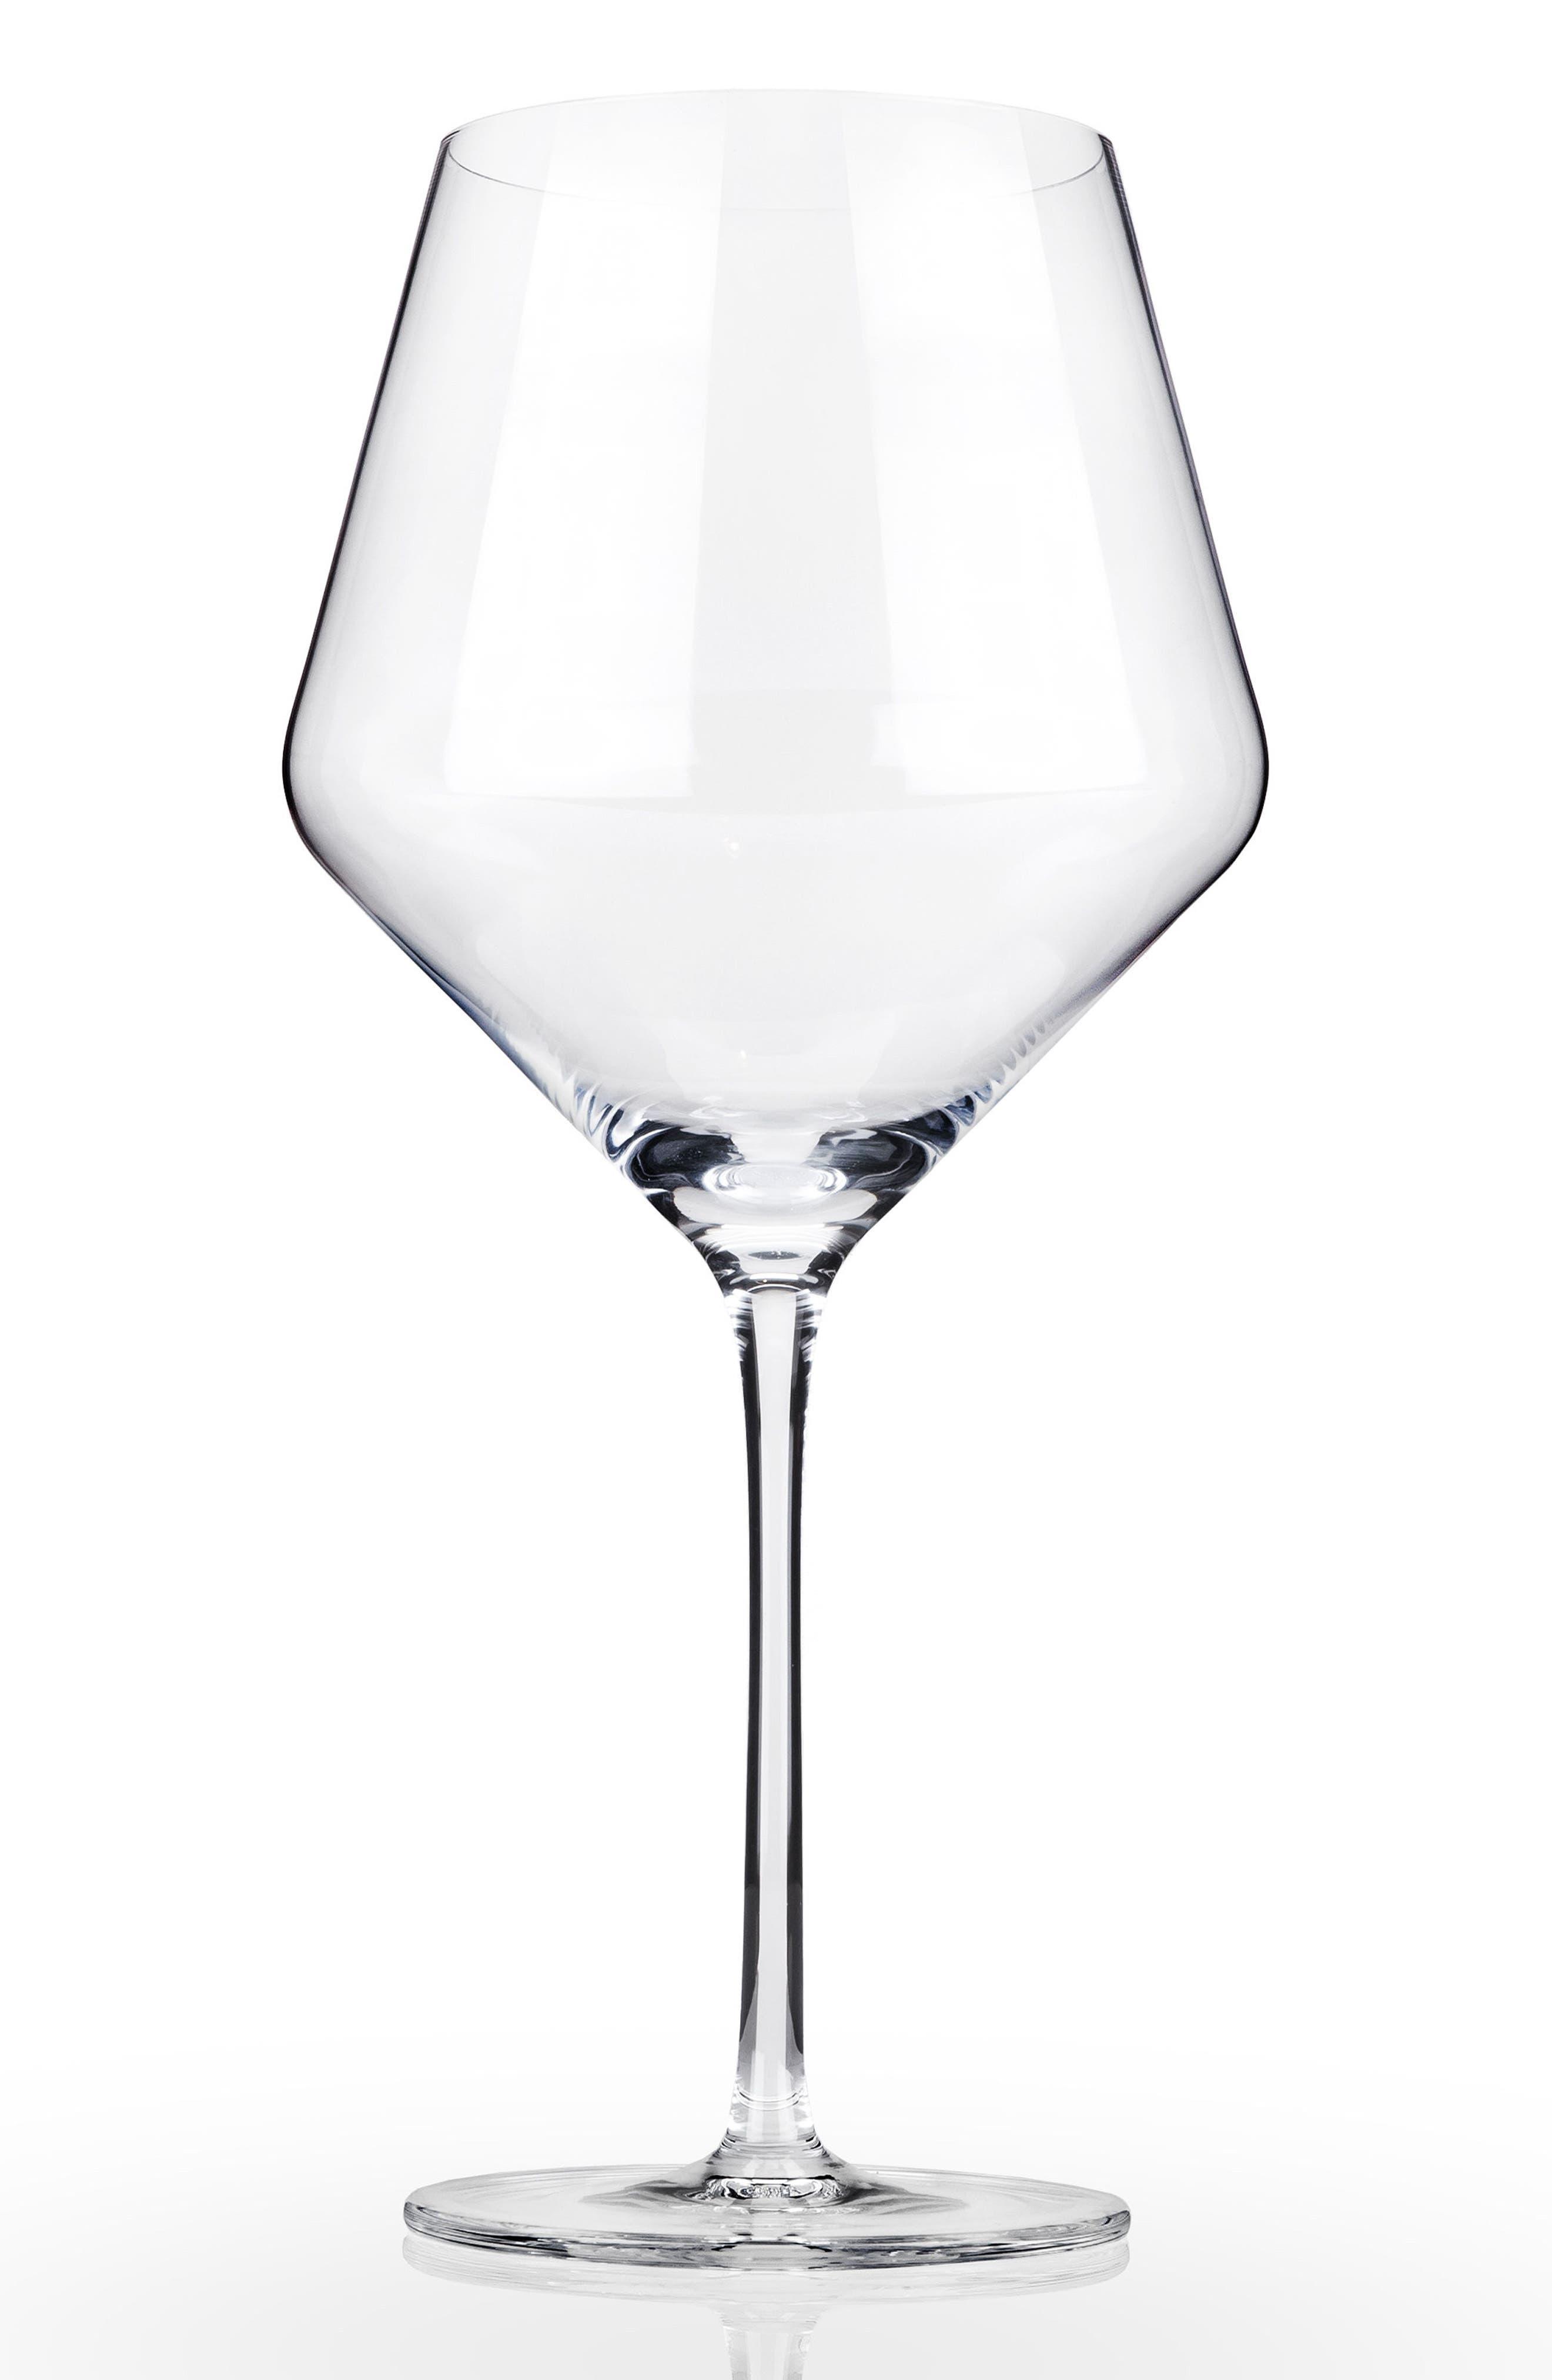 Raye Set of 2 Burgundy Glasses,                             Main thumbnail 1, color,                             Clear